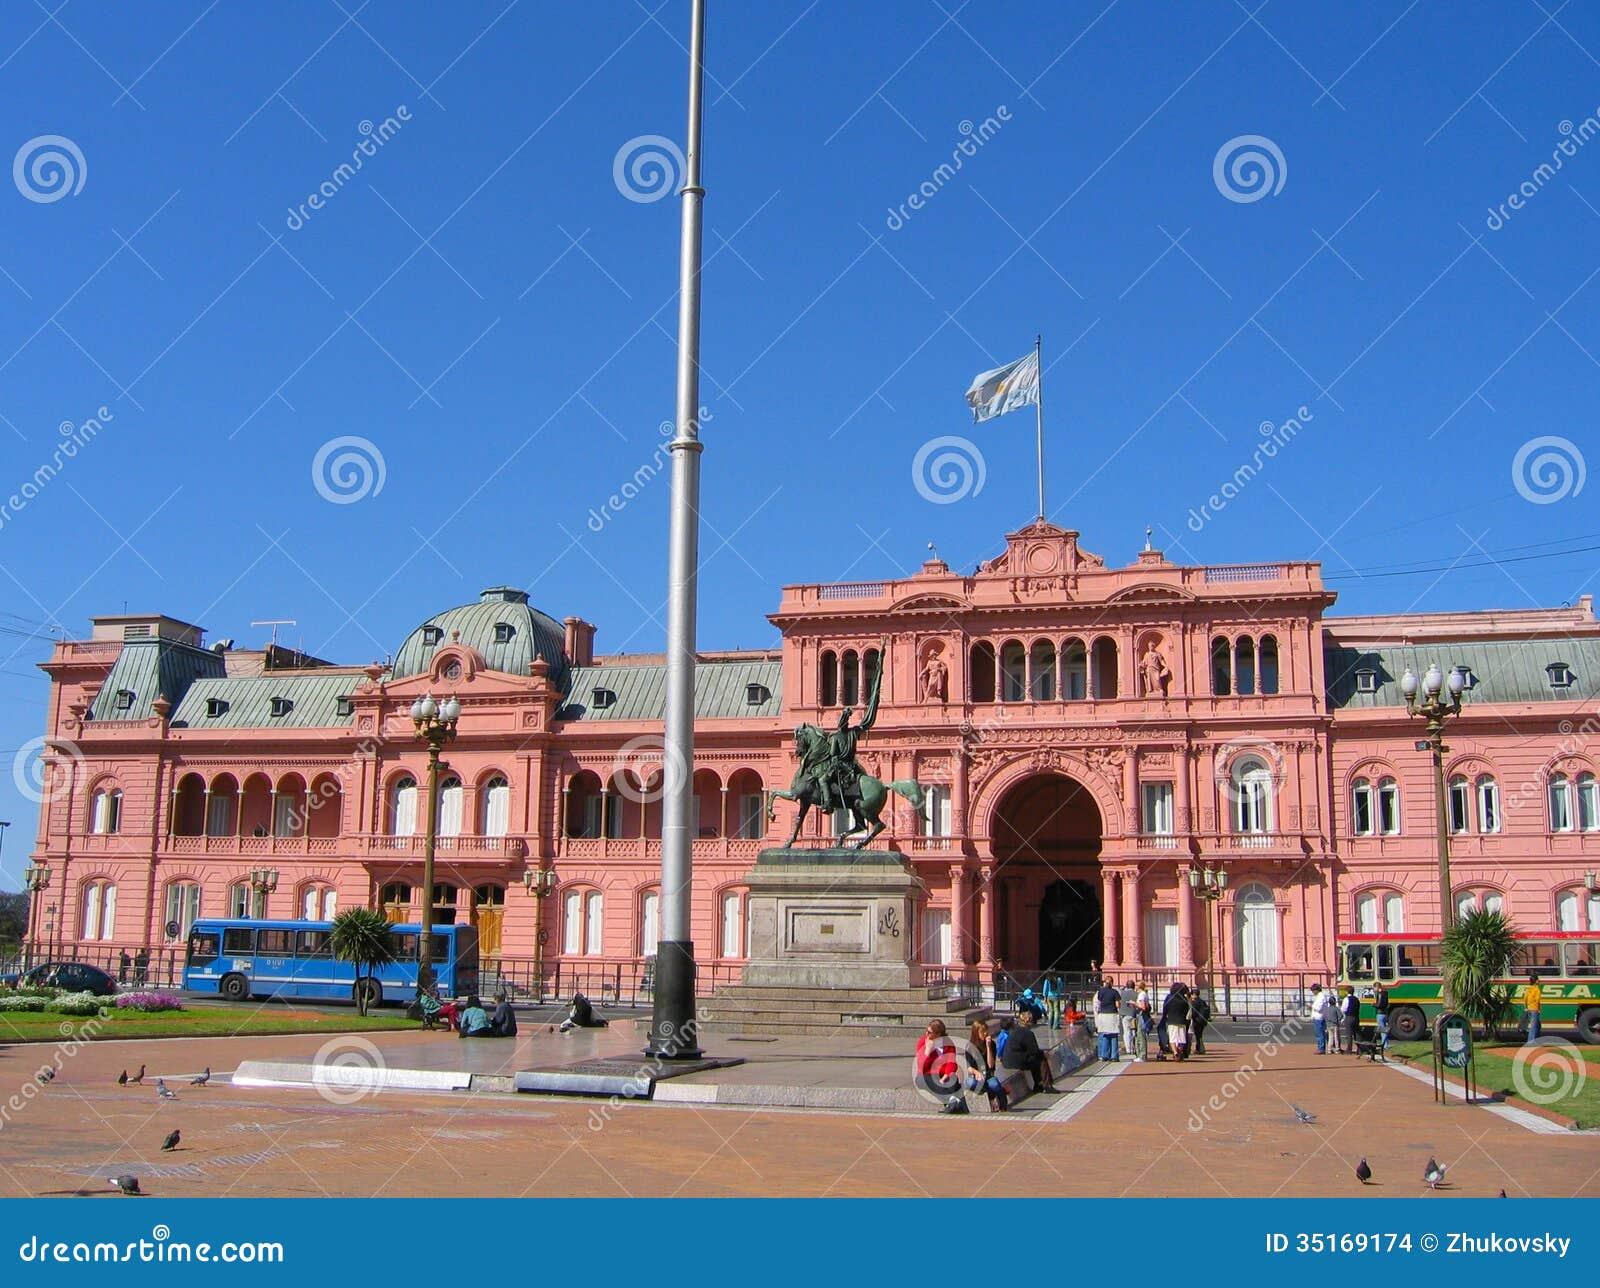 Casa rosada in buenos aires argentina editorial stock for Casa argentina